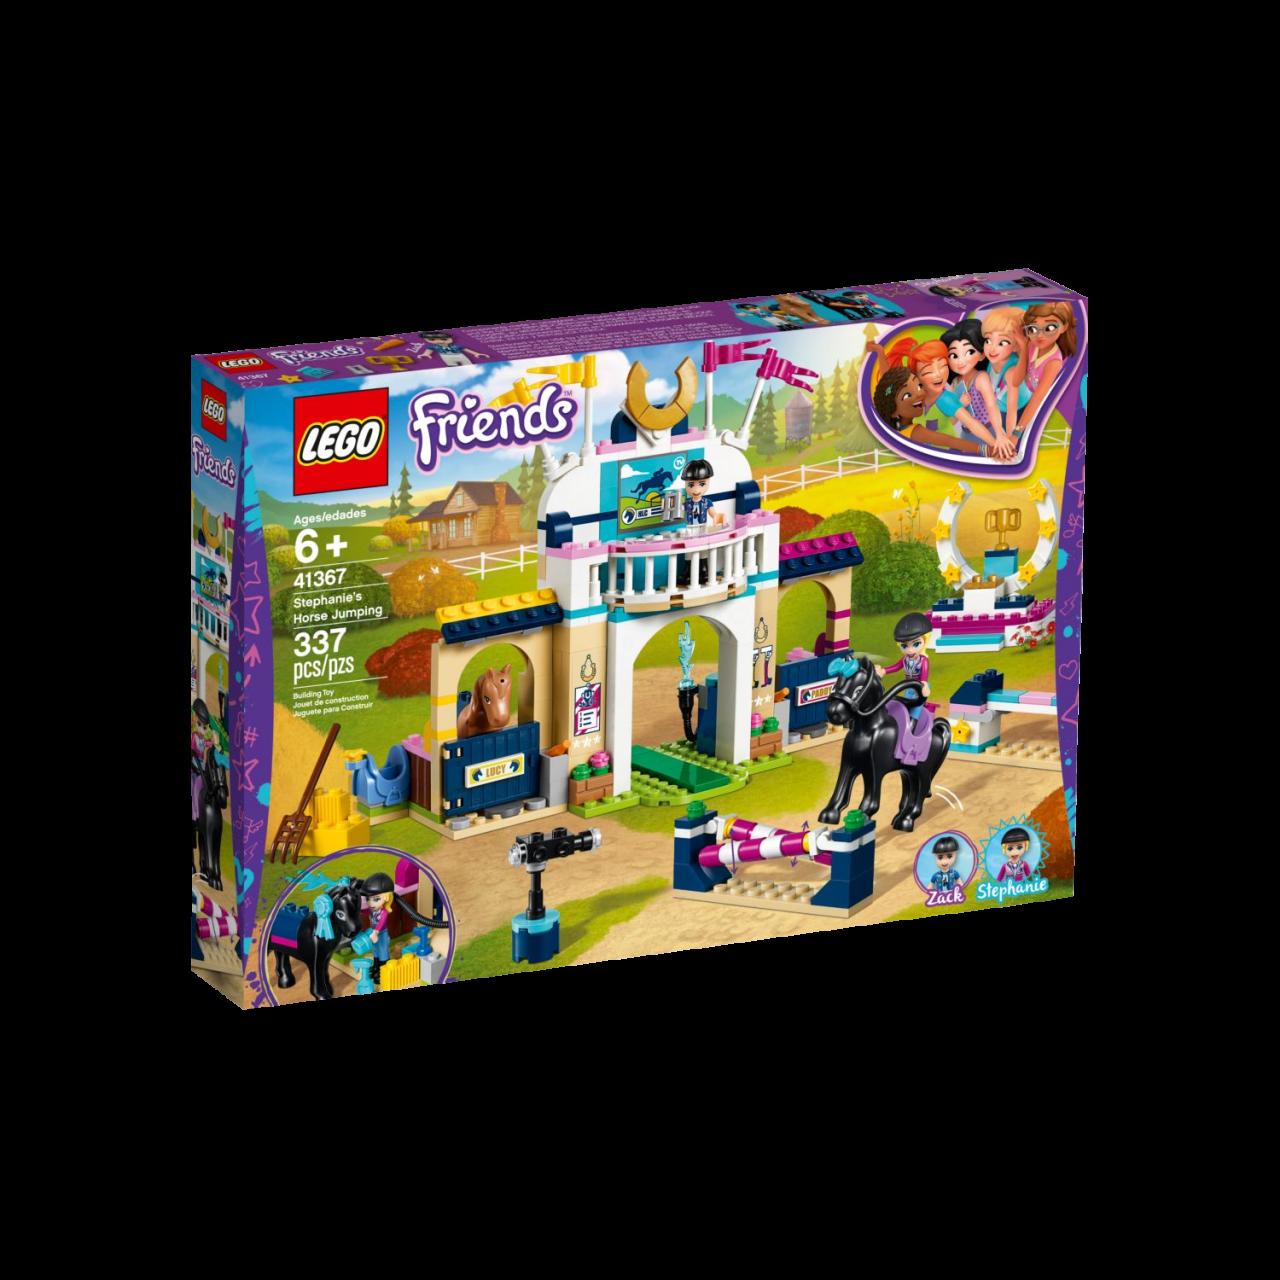 LEGO FRIENDS 41367 Stephanies Reitturnier